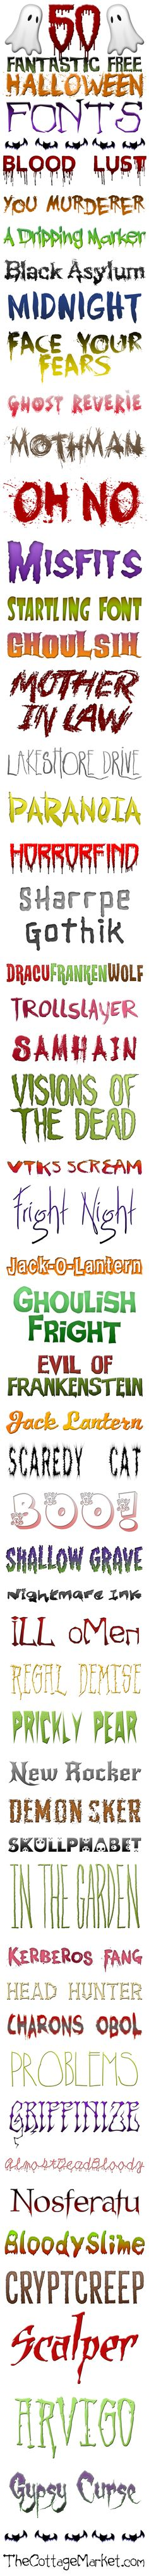 1000 ideas about cricut fonts on pinterest cricut for Cricut craft room fonts